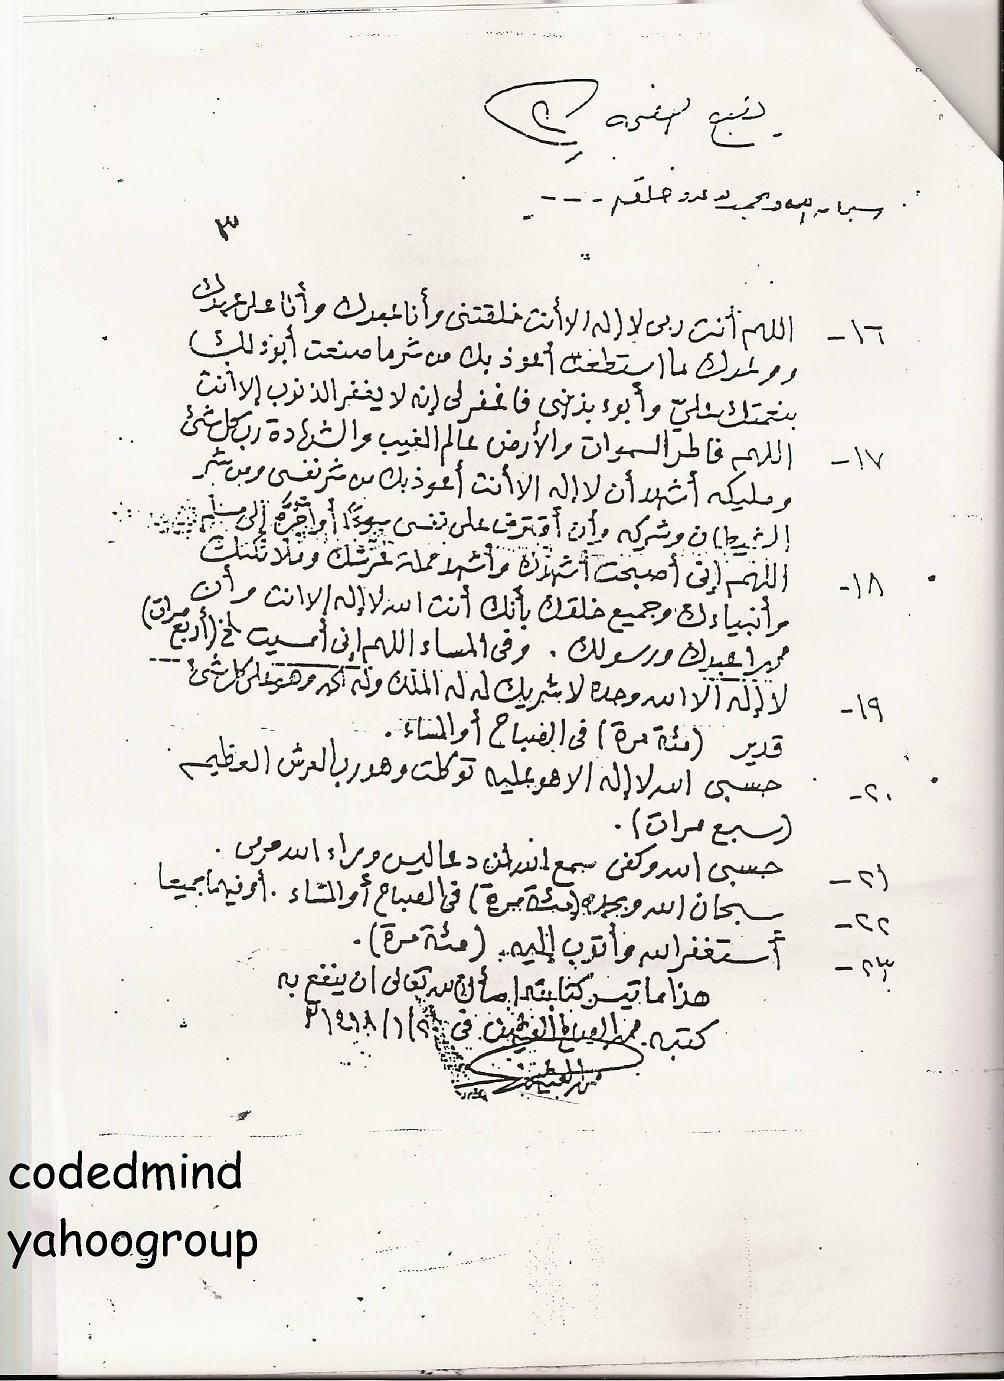 bdad5fc64a984 برنامج المكتبة الشاملة - http   www.shamela.ws